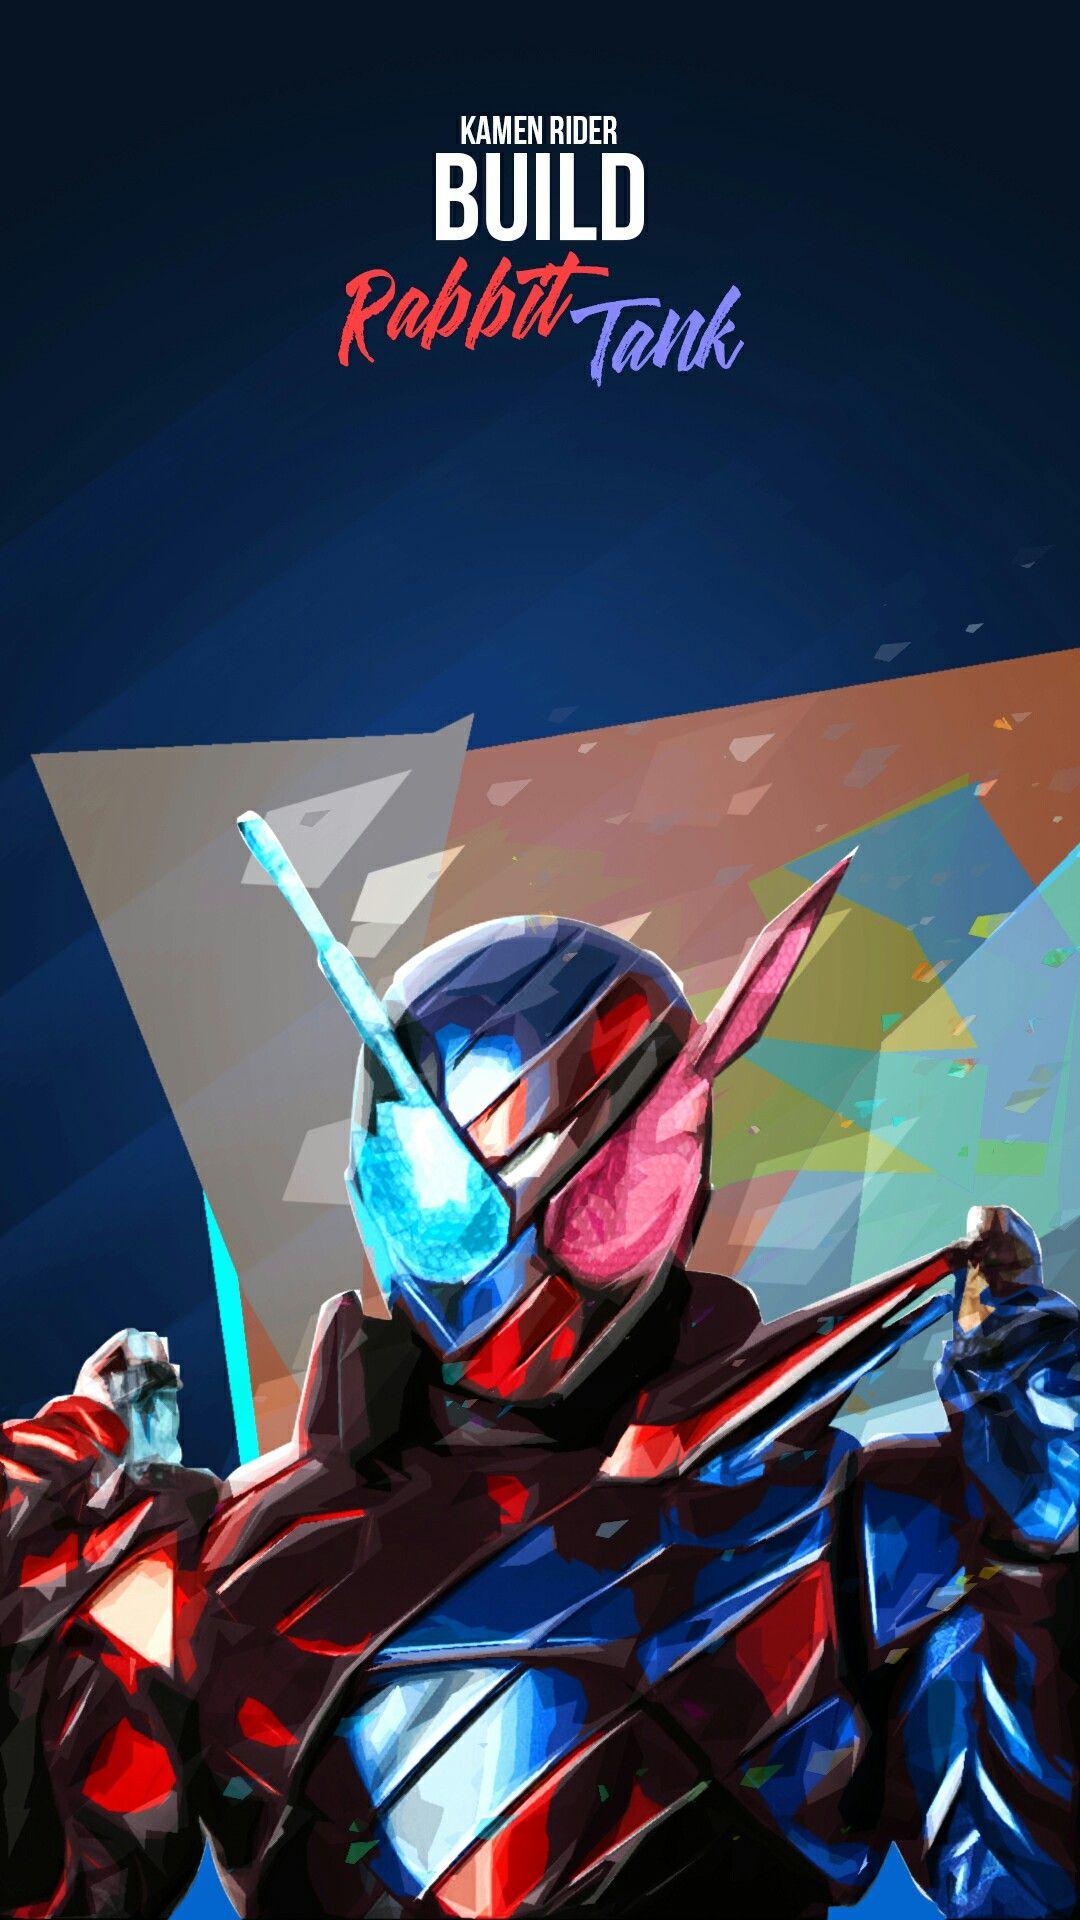 Kamen Rider Build Rabbit Tank Wallpaper Pahlawan Super Animasi Gambar